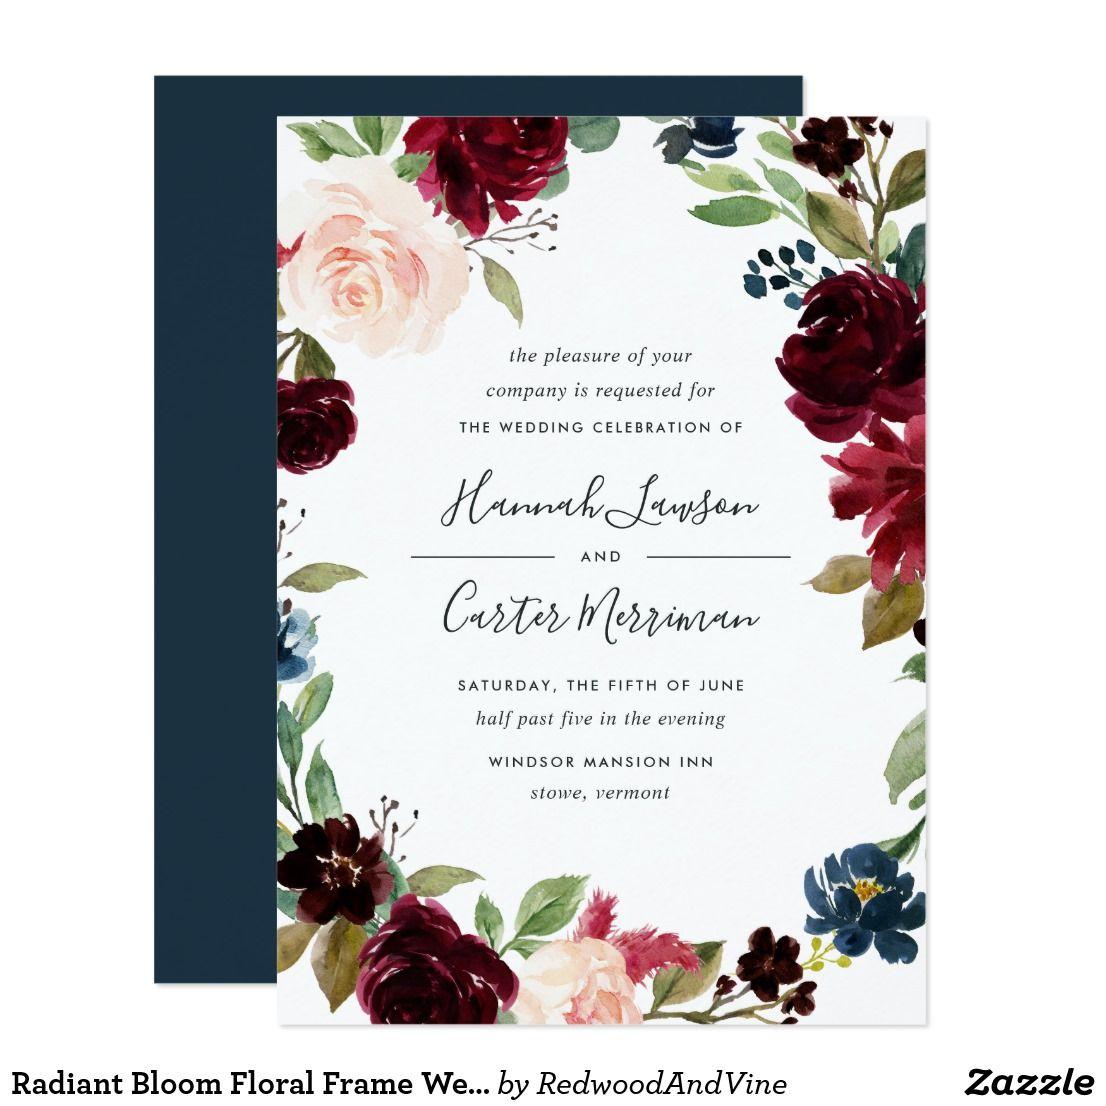 Radiant Bloom Floral Frame Wedding Invitation | Invites wedding ...